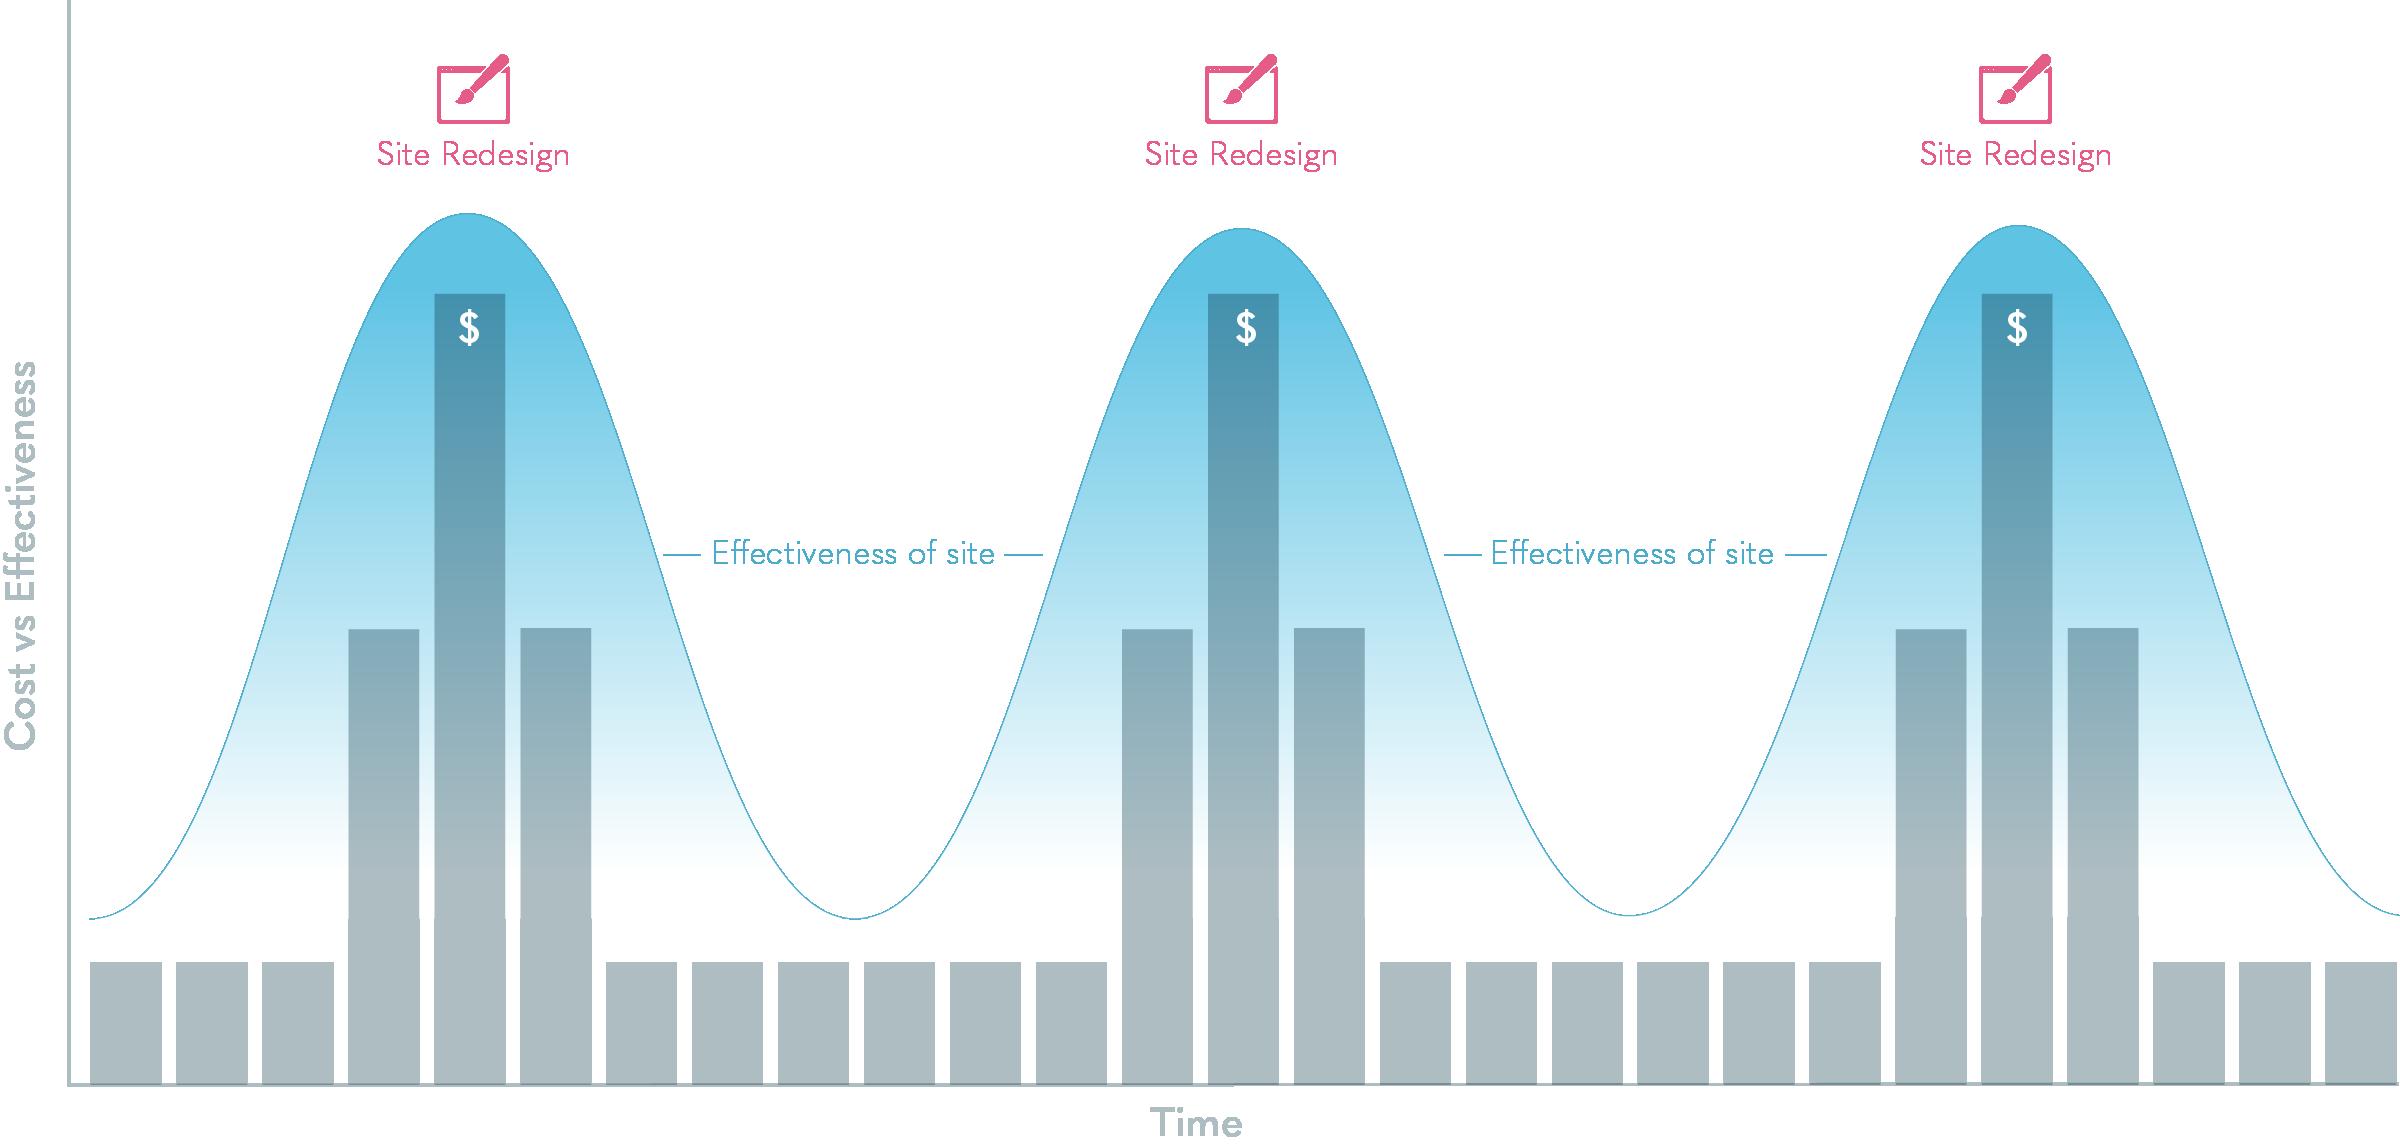 Website cost vs effectiveness over time.